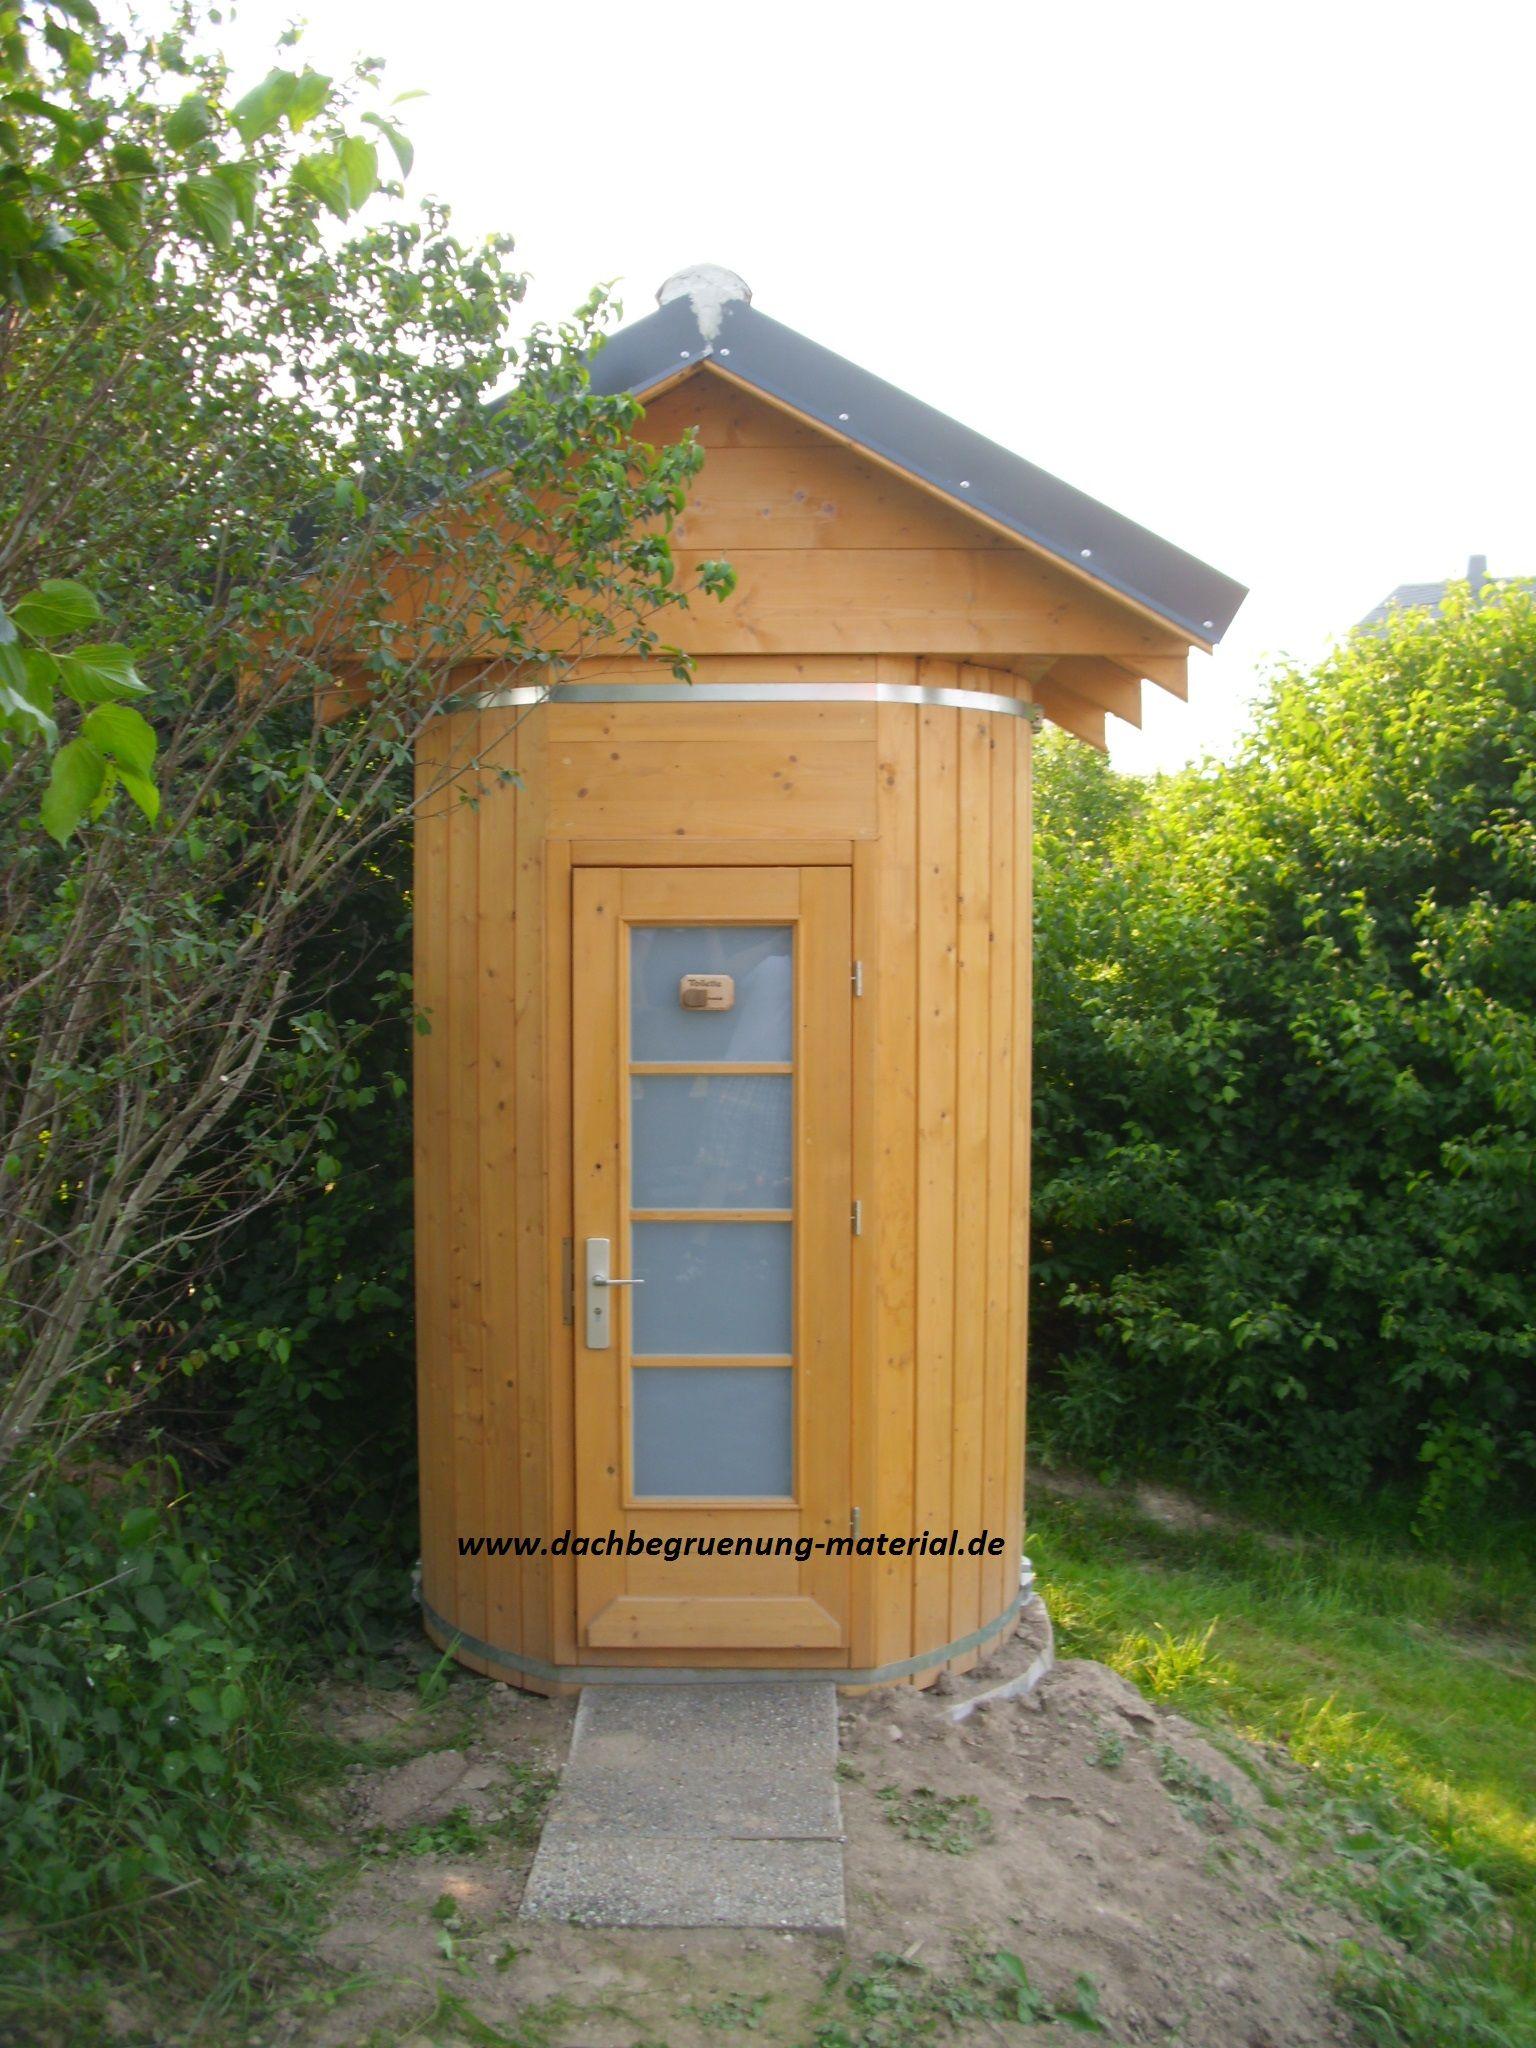 fasssauna garten wc bei fass sauna russische fasssauna. Black Bedroom Furniture Sets. Home Design Ideas